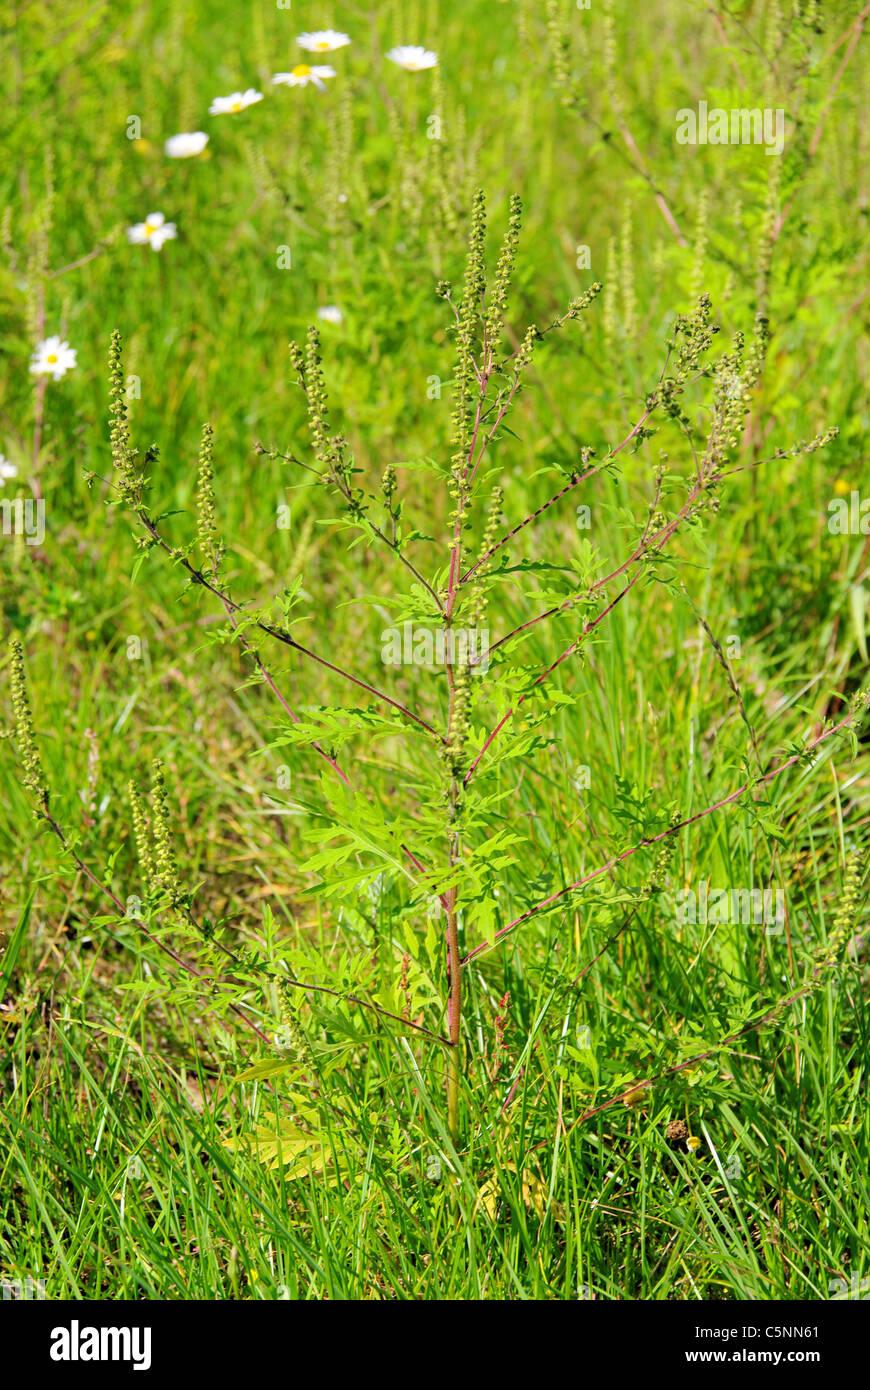 Ambrosia - Common Ragweed 01 Stock Photo